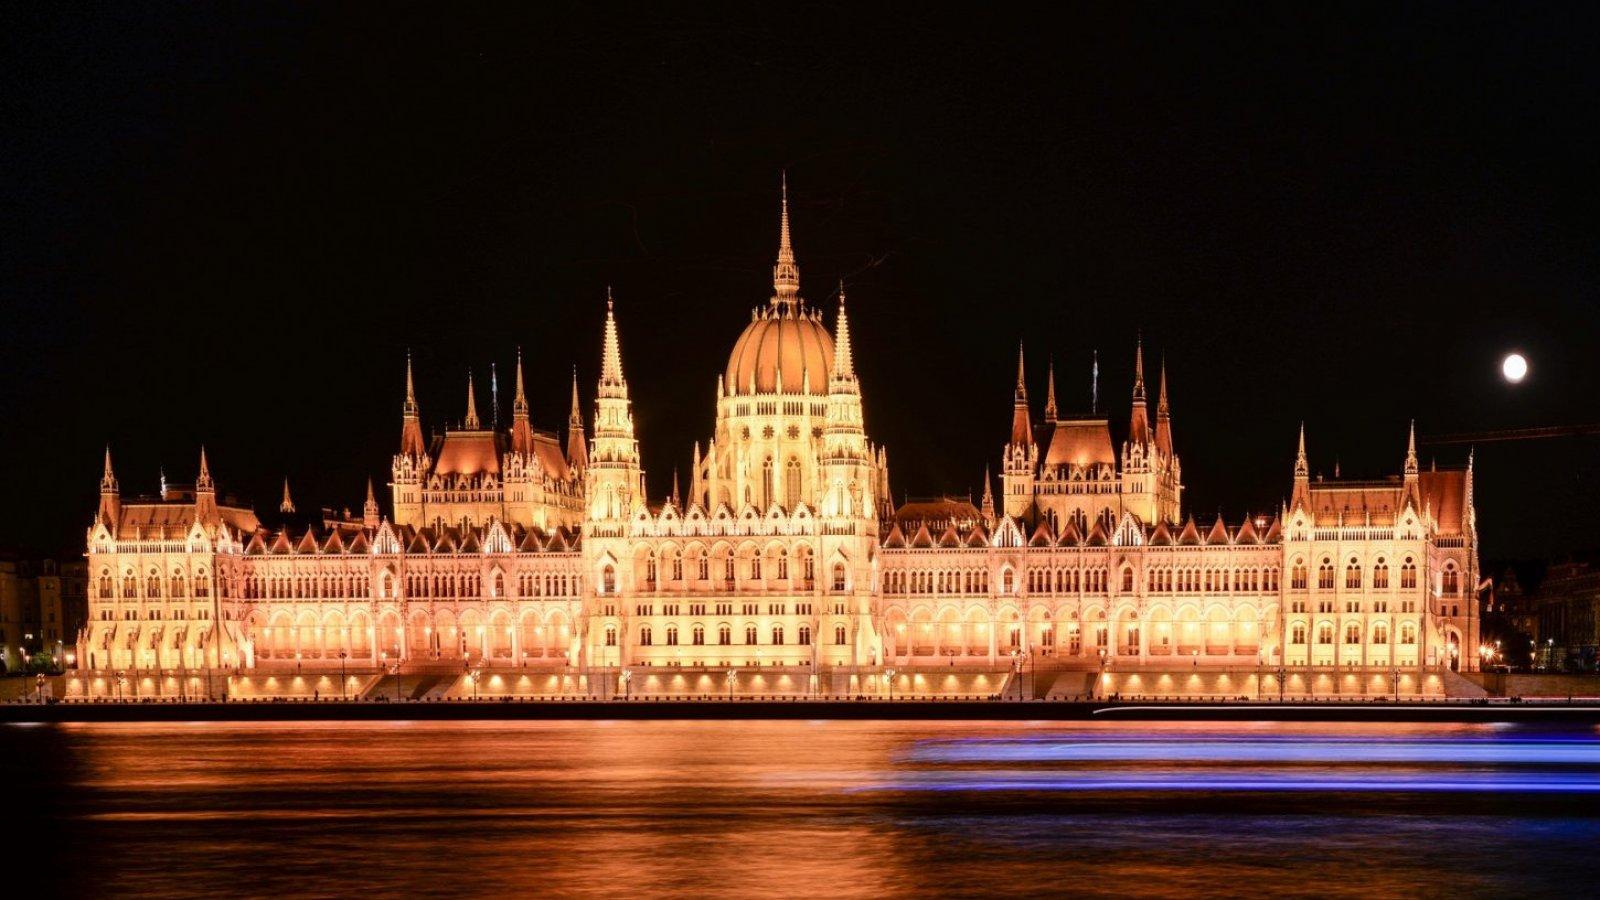 Déjate seducir por la magia del impresionante parlamento de Budapest